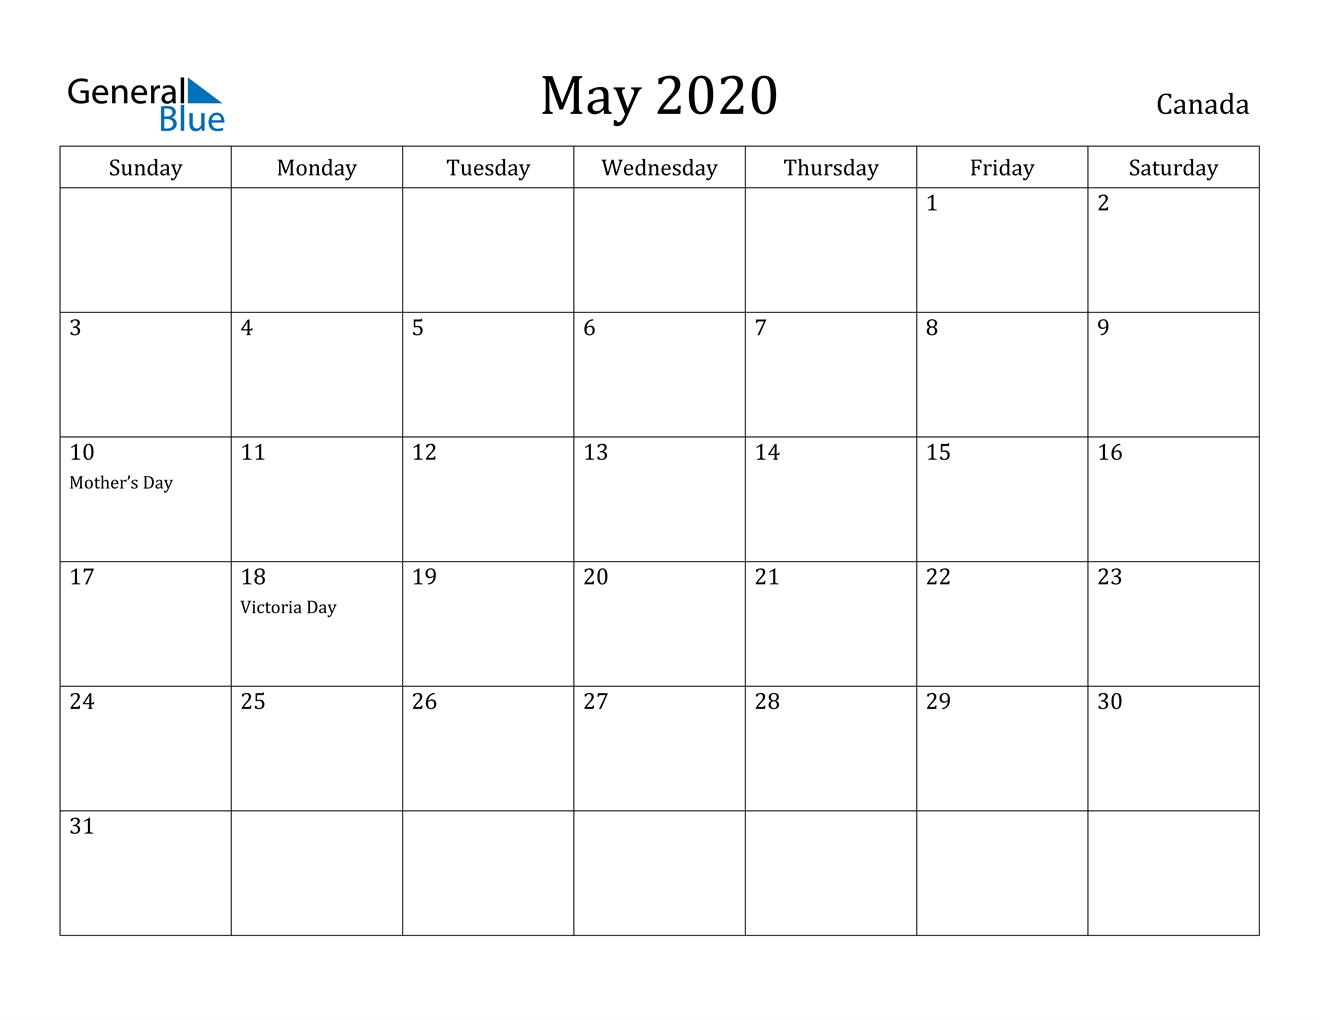 May 2020 Calendar - Canada